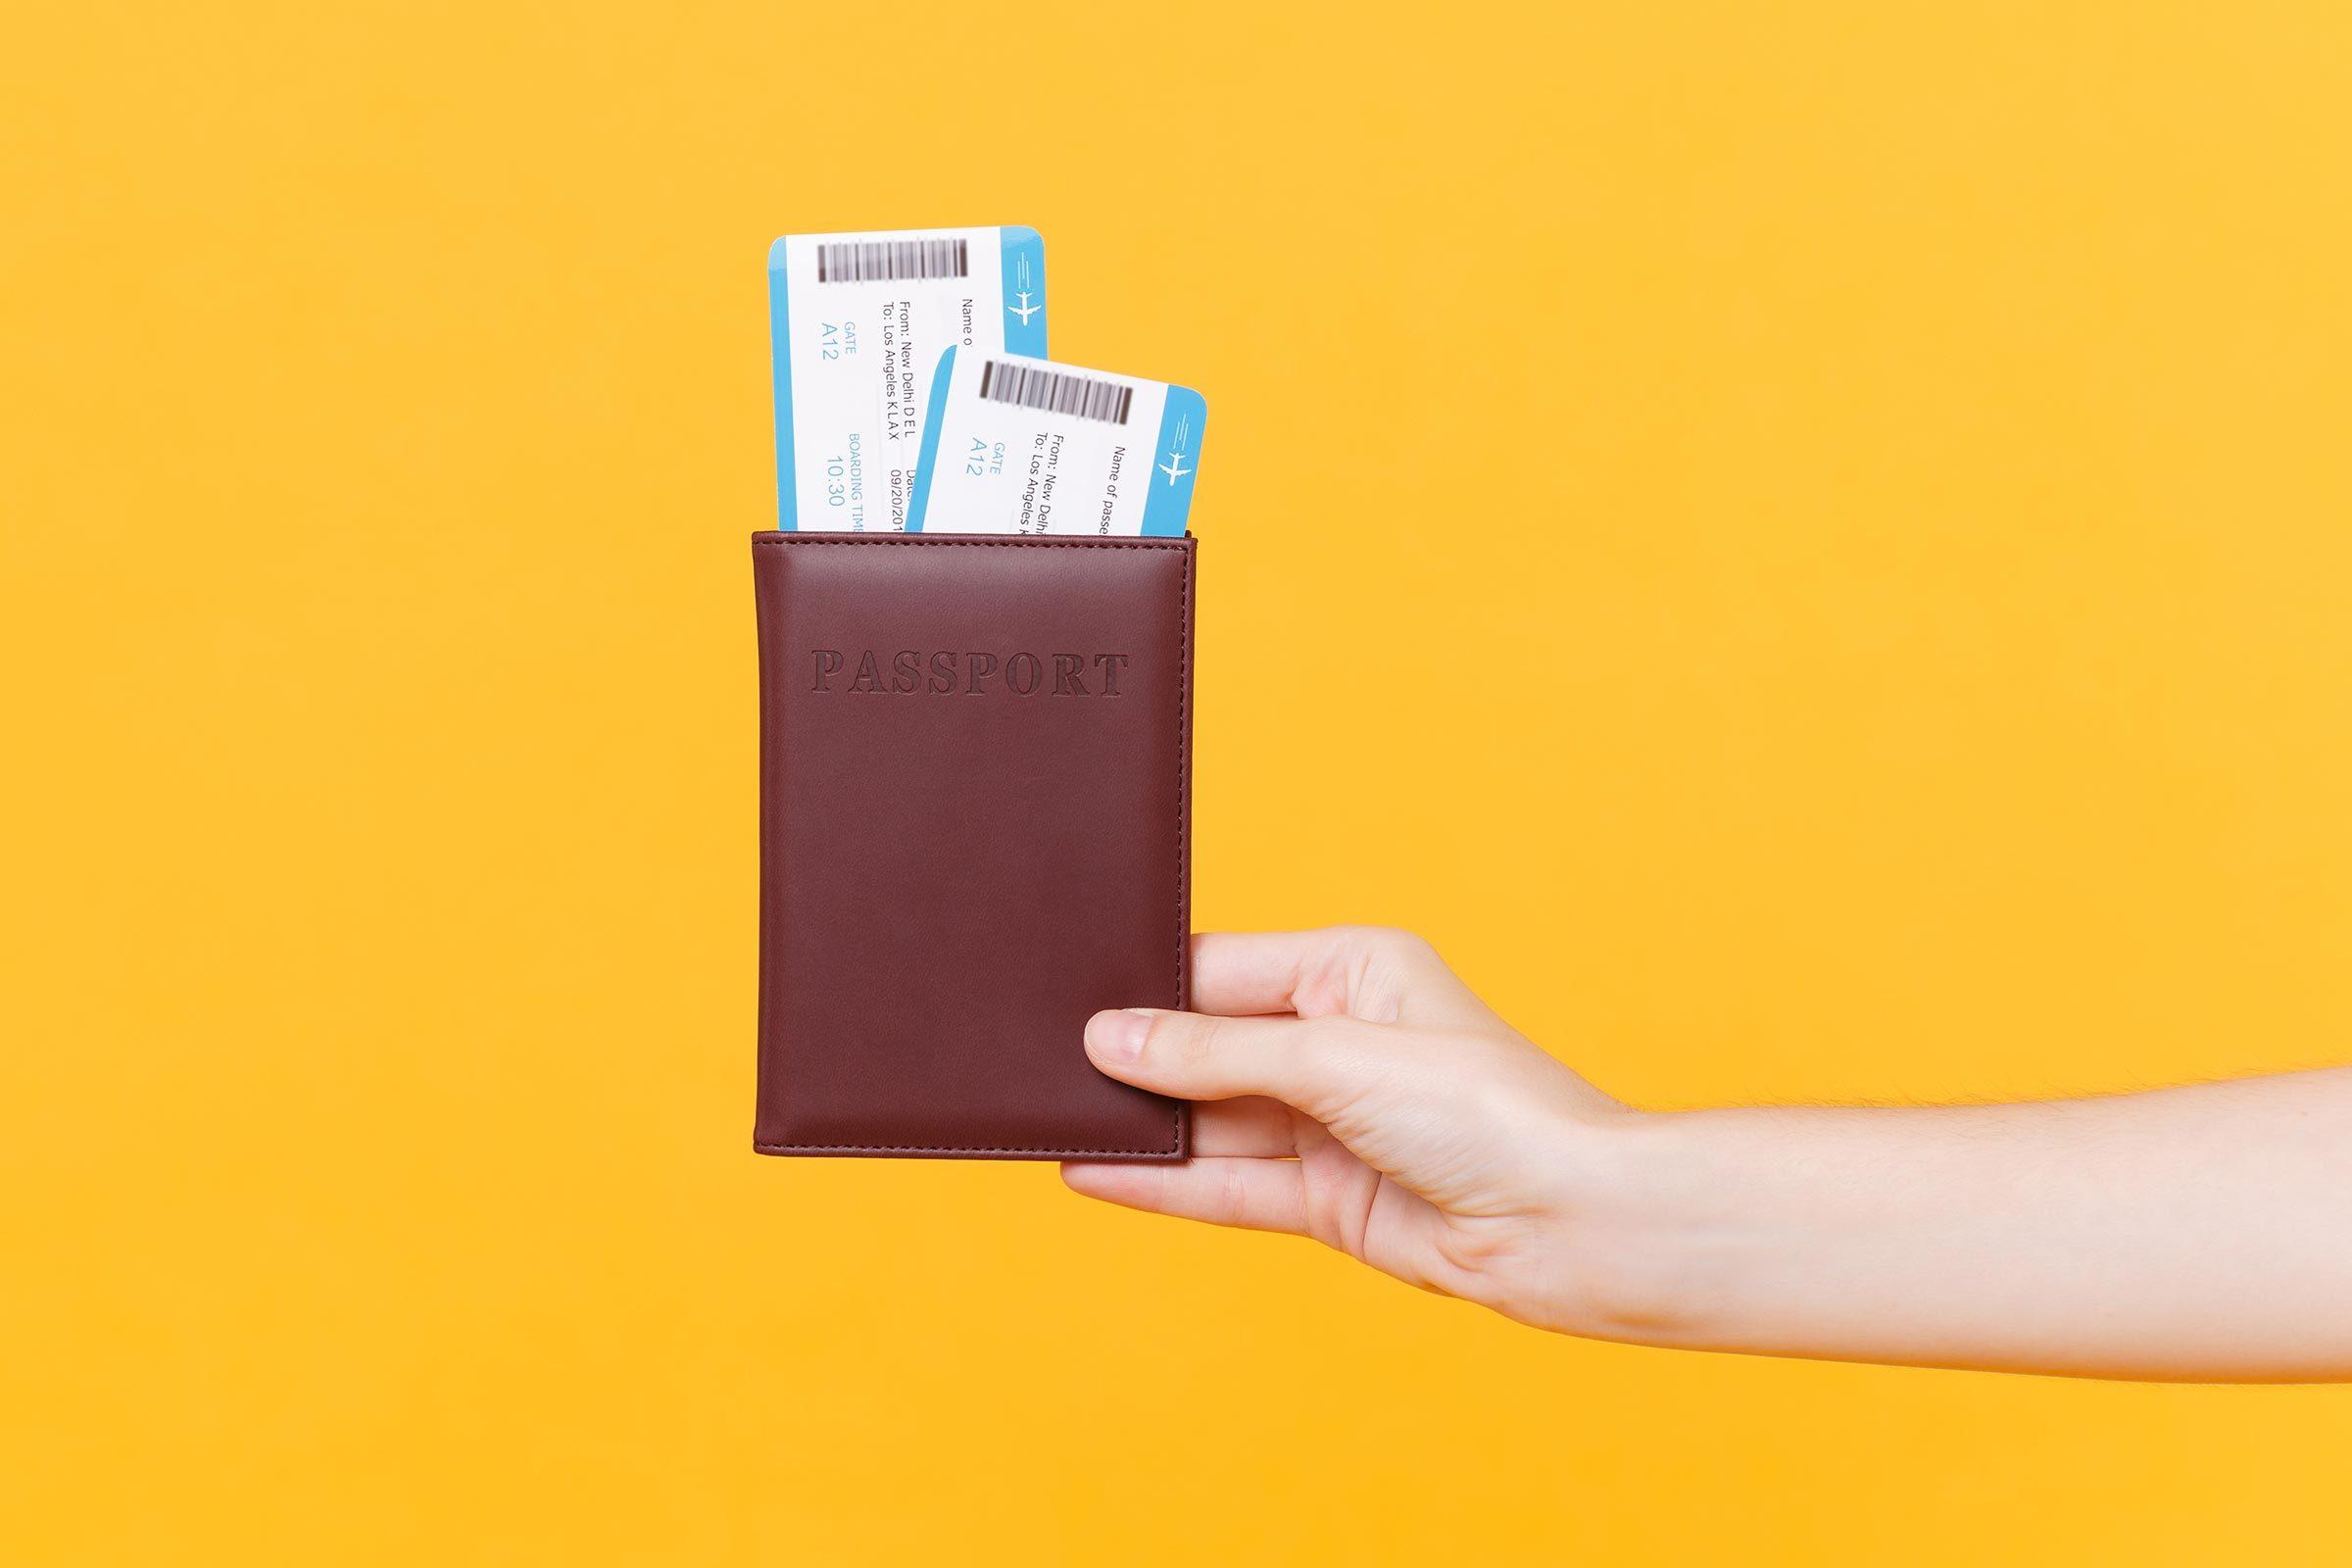 hand holding passport flight tickets boarding pass yellow background